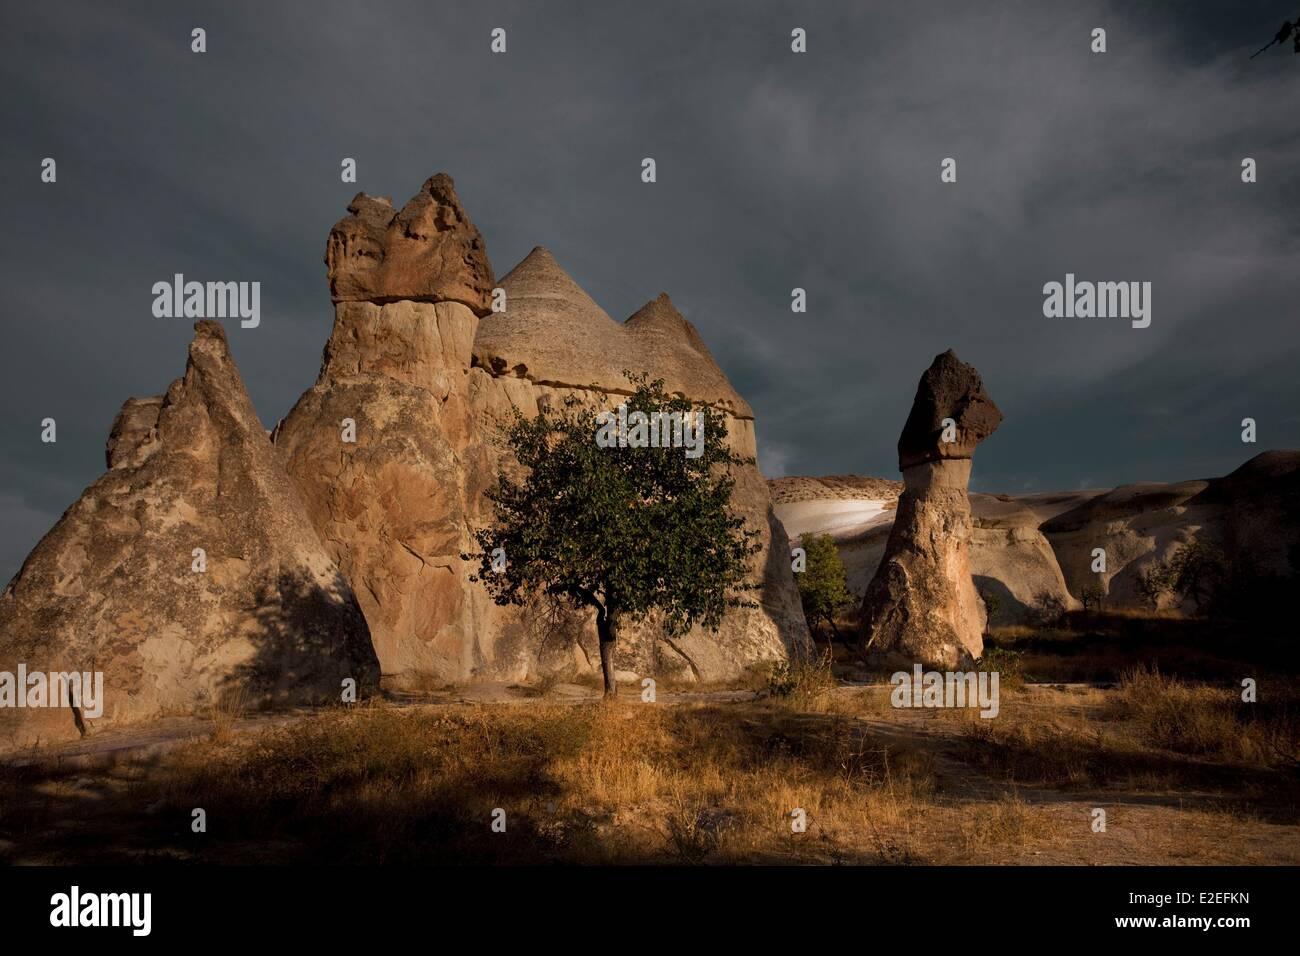 Turkey, Central Anatolia, Capadoccia, Pasabagi valley, listed as World Heritage by the UNESCO - Stock Image